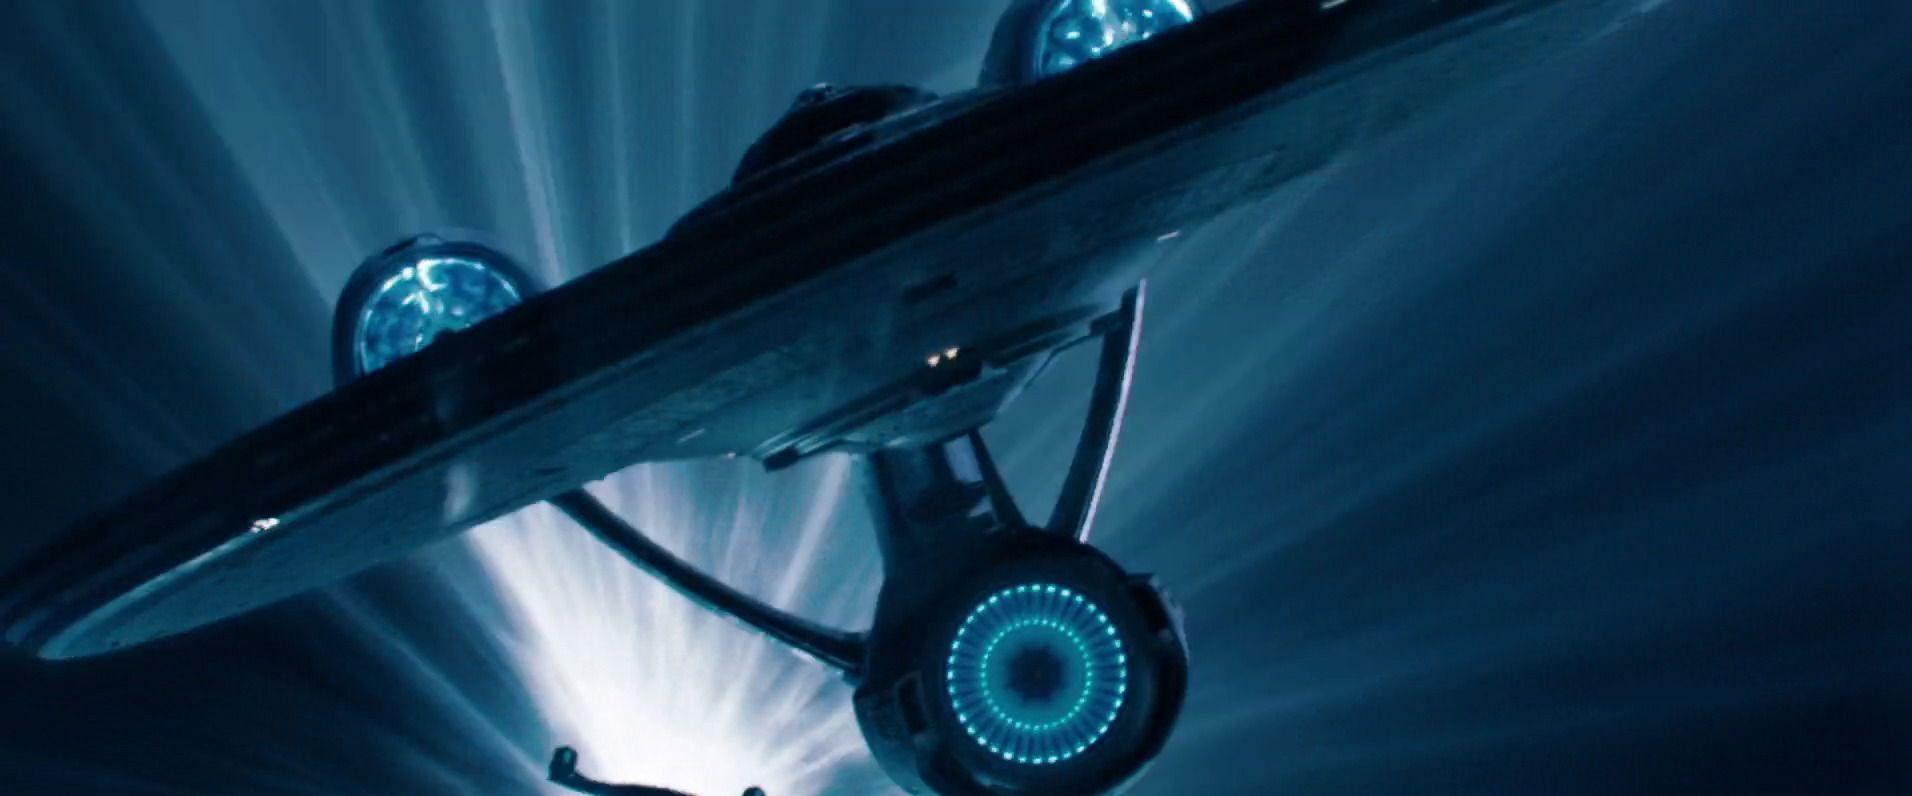 Star Trek Into Darkness (2013) - Star Trek Screencaps.com